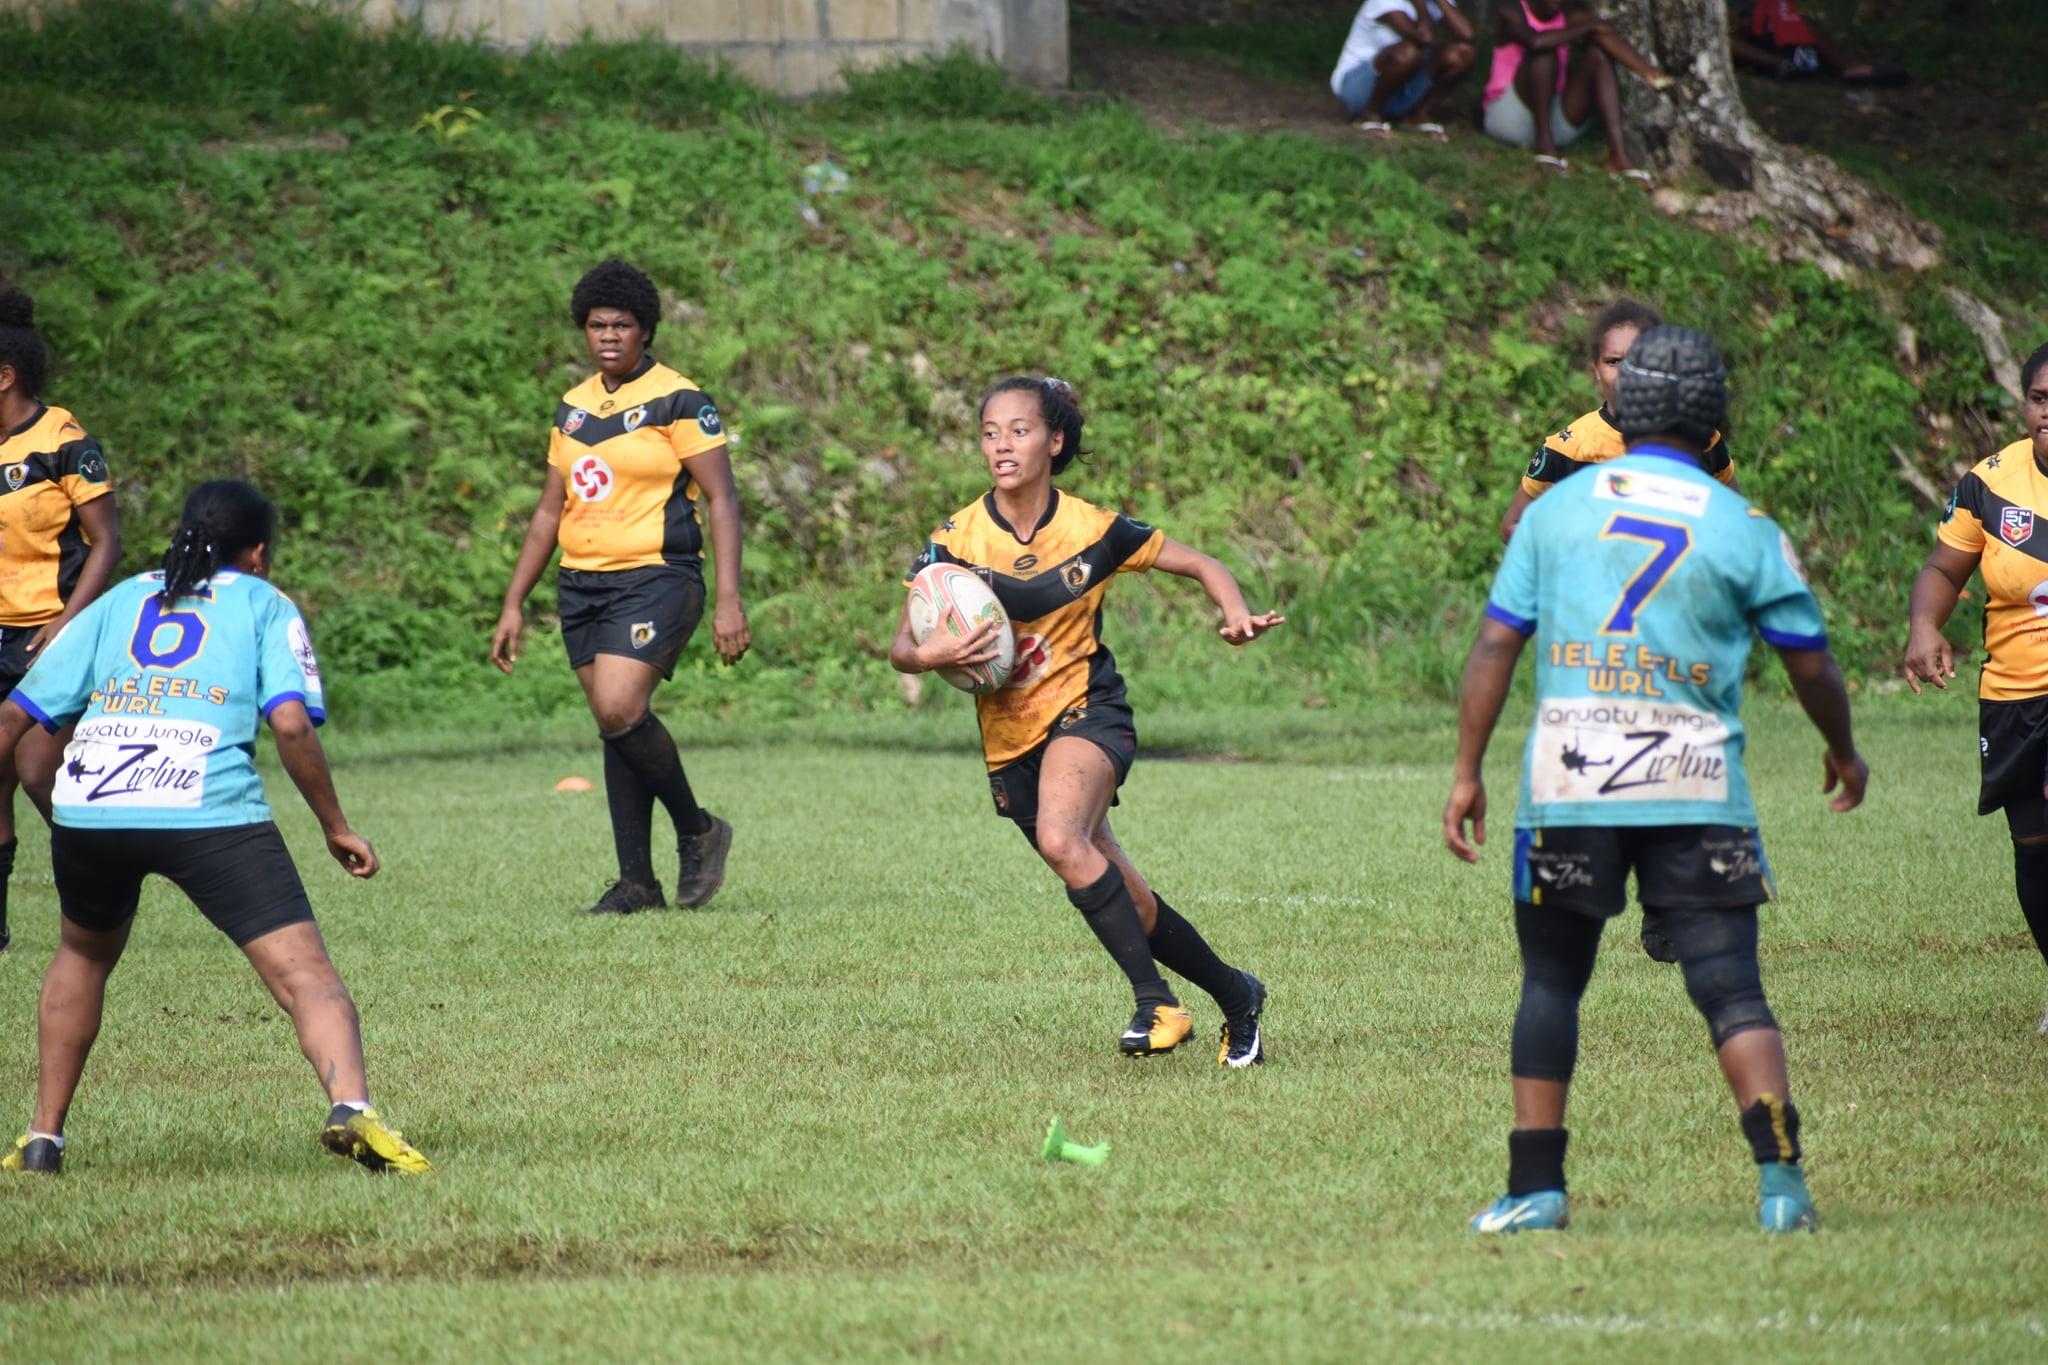 Port Vila Grand Final Day this Saturday